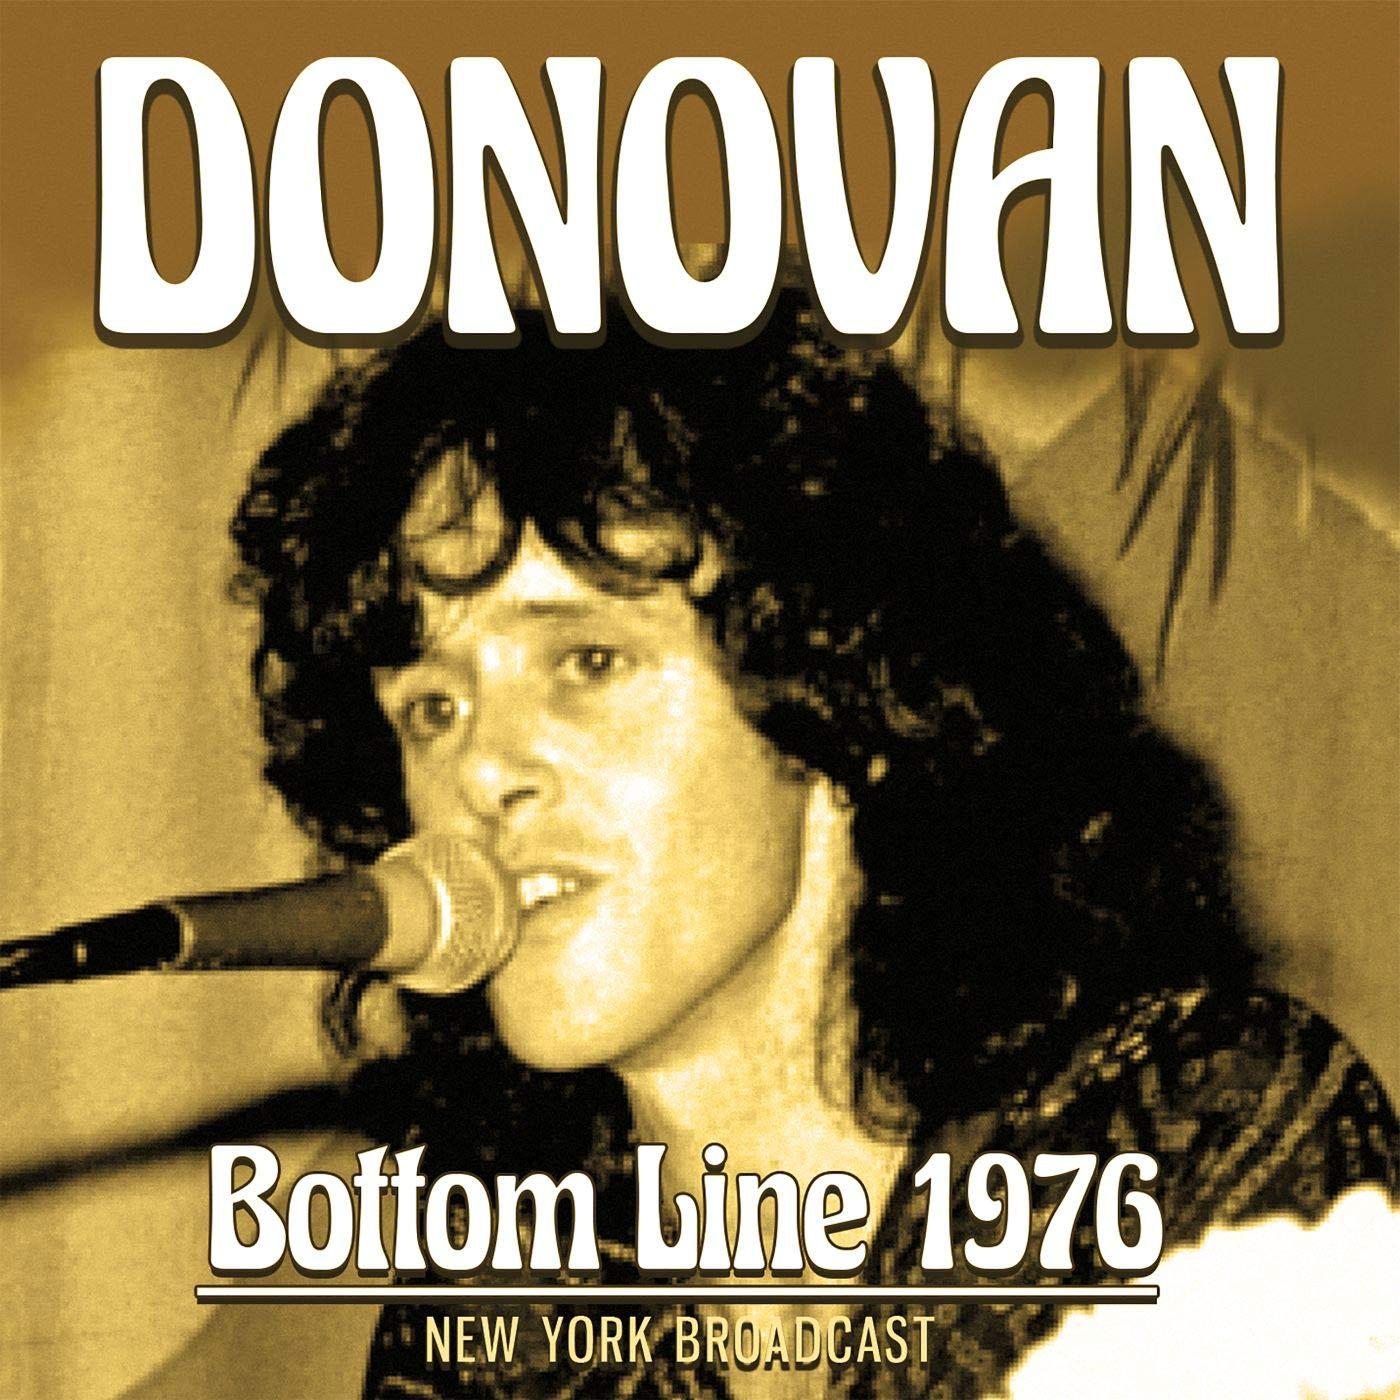 Bottom Line 1976